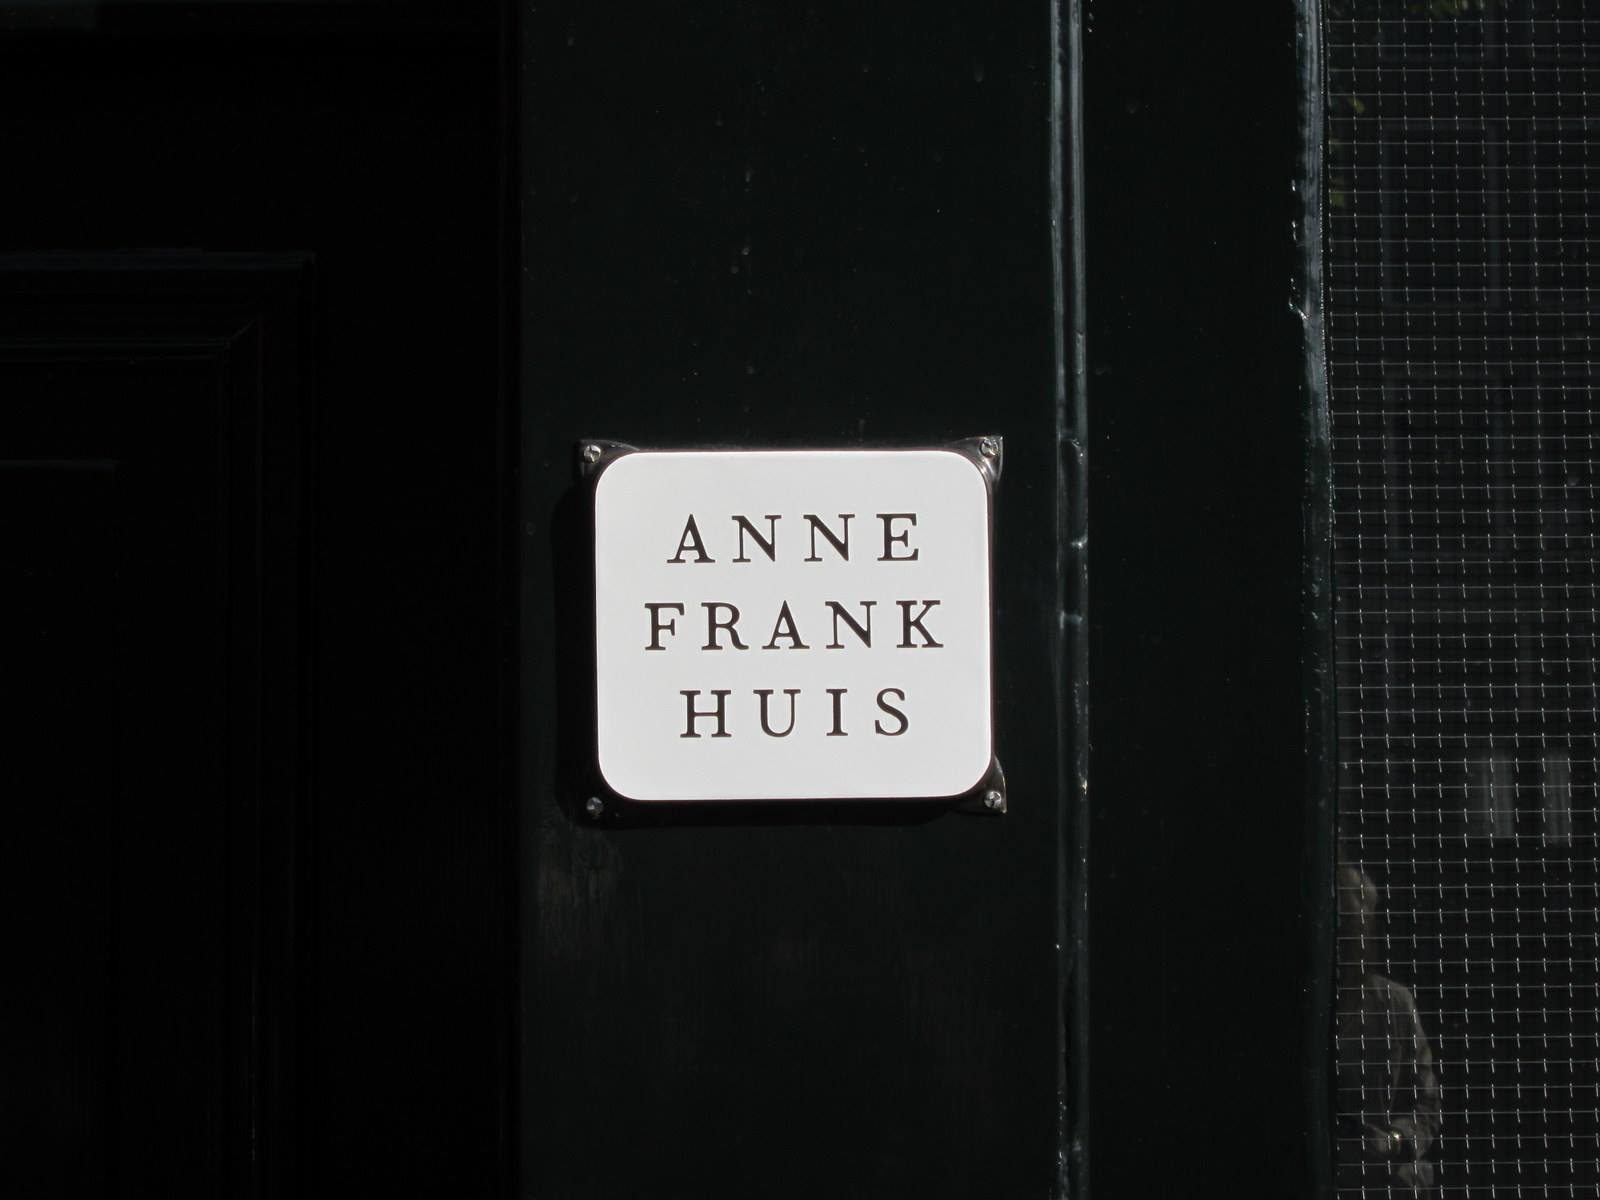 Sing of Anna Frank Huis - Letrero: Casa de Ana Frank | Anna Frank Huis | 5 Museos importantes de Amsterdam